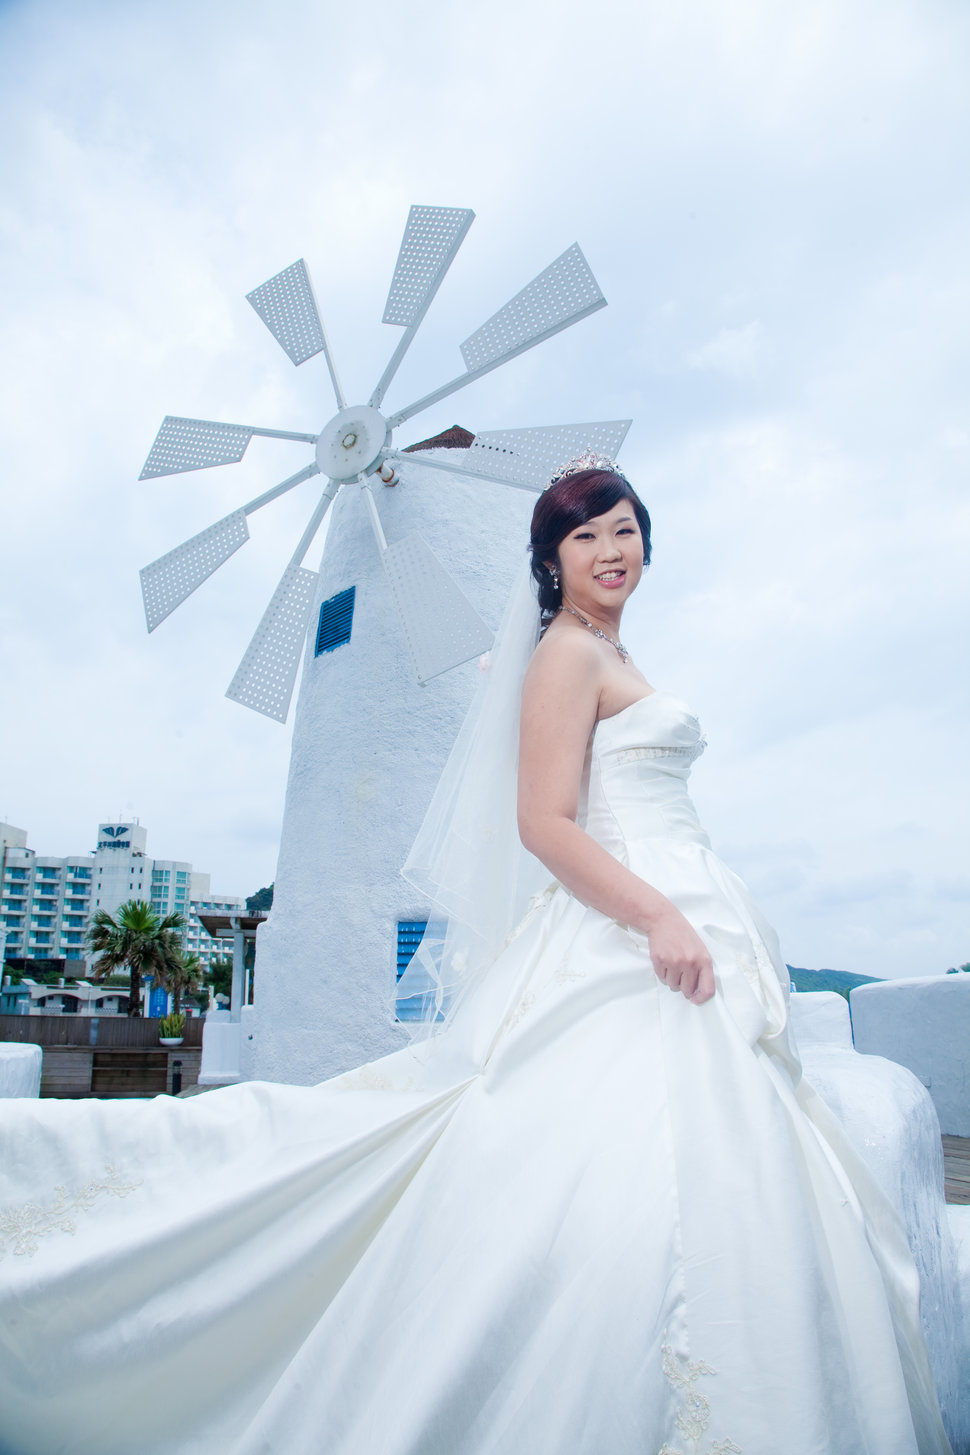 IMG_4707 - 全台最便宜-45DESIGN四五婚紗禮服《結婚吧》